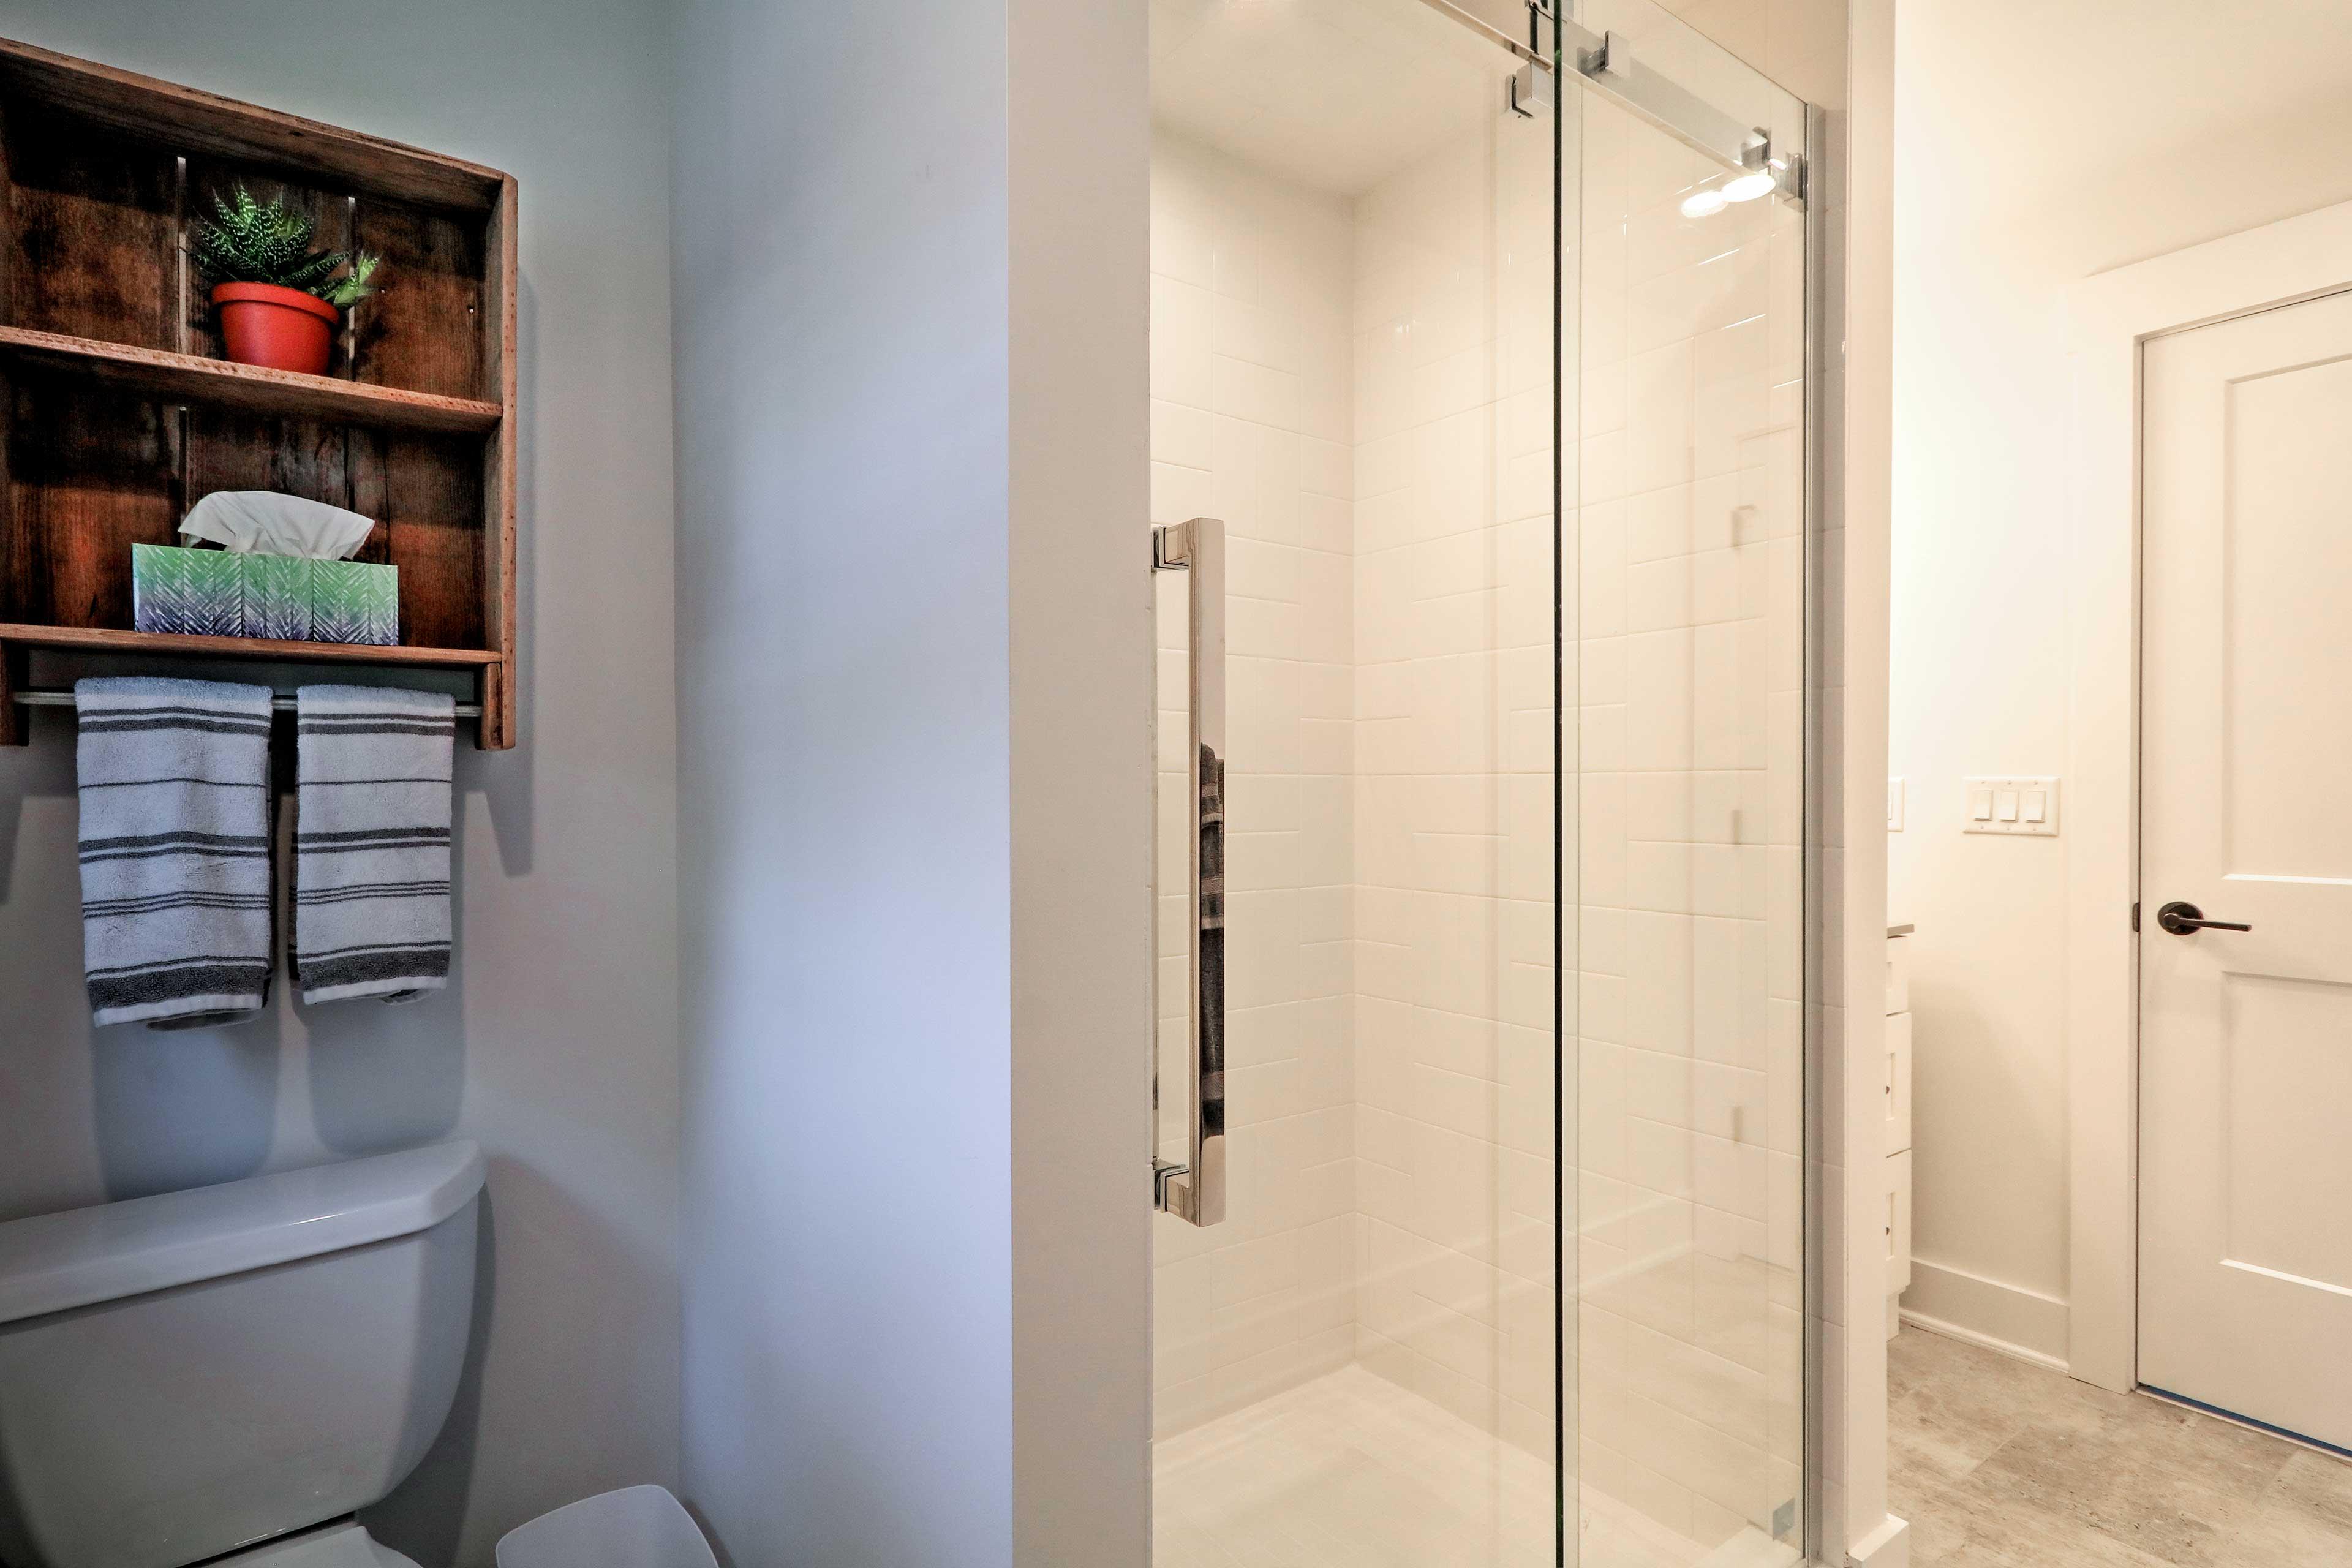 Rinse off in the pristine walk-in shower!